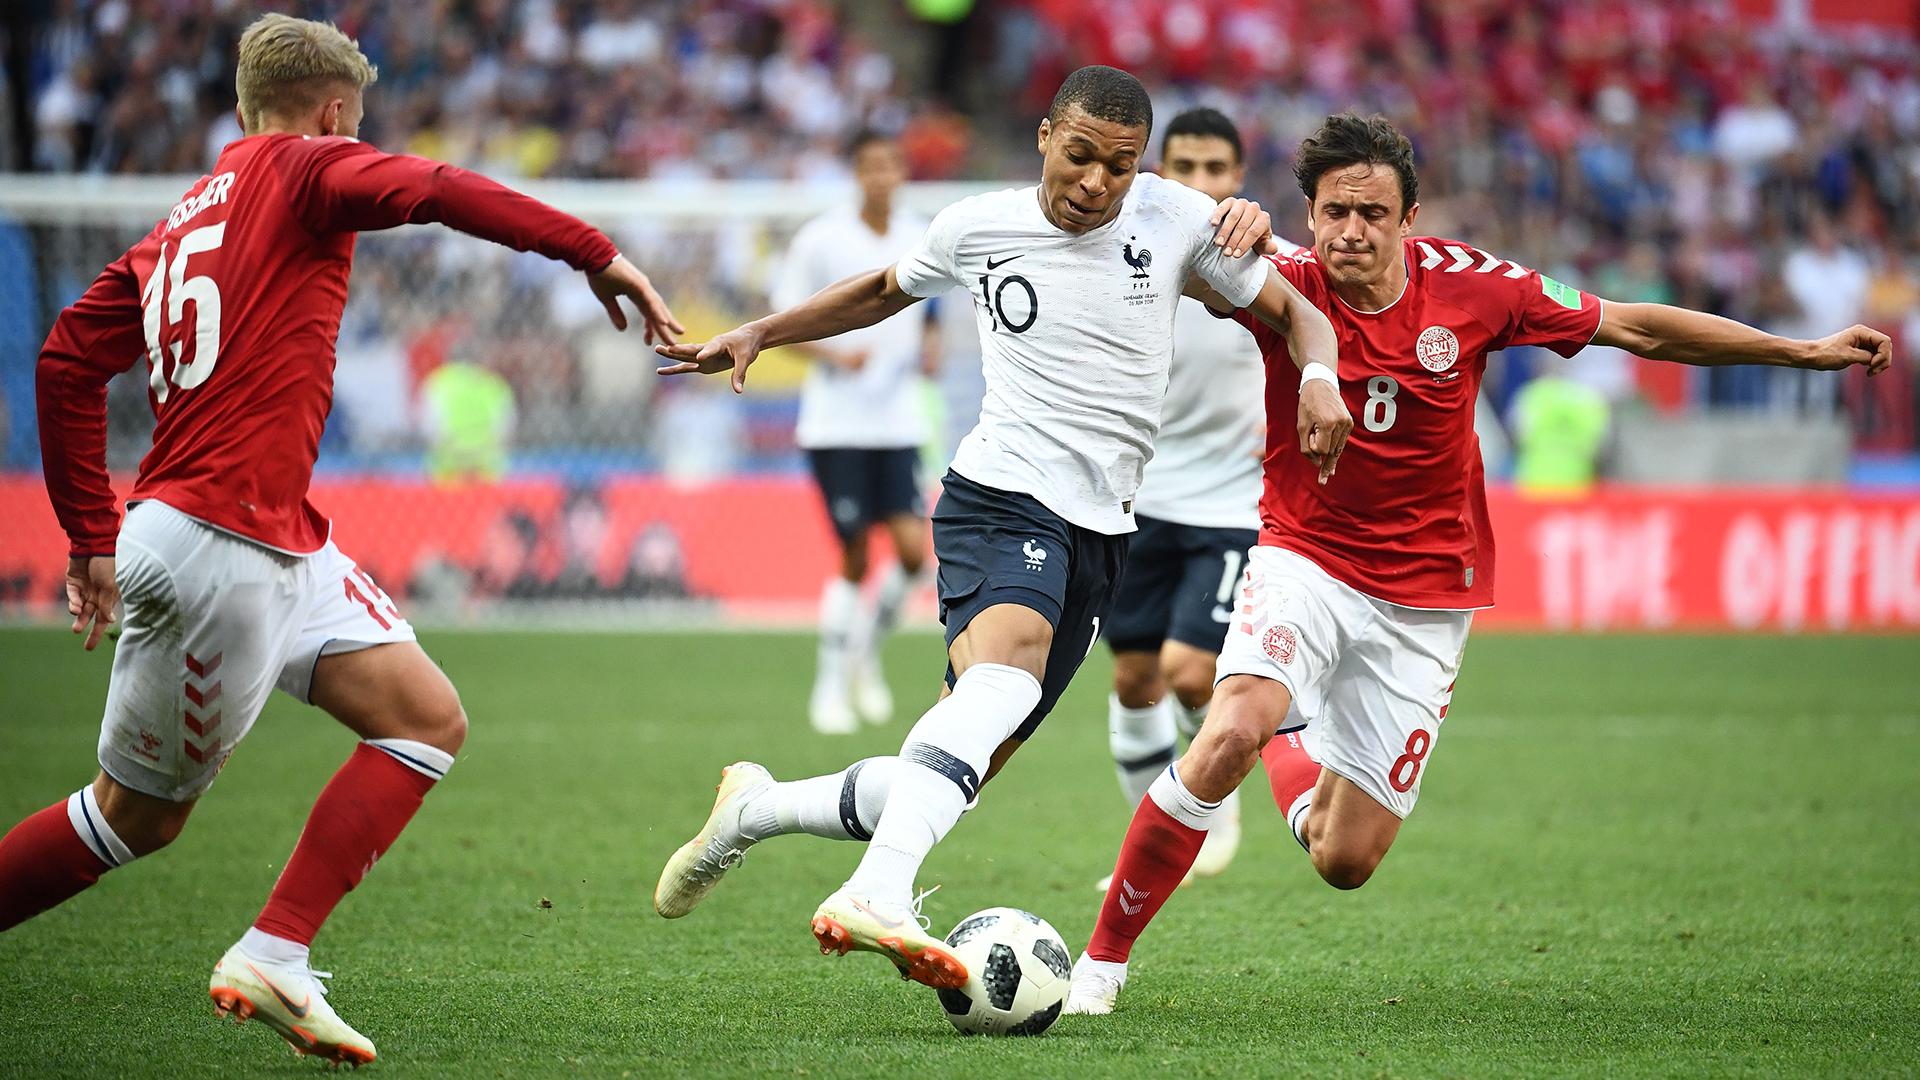 Soccer France vs Argentina TV channel, live stream